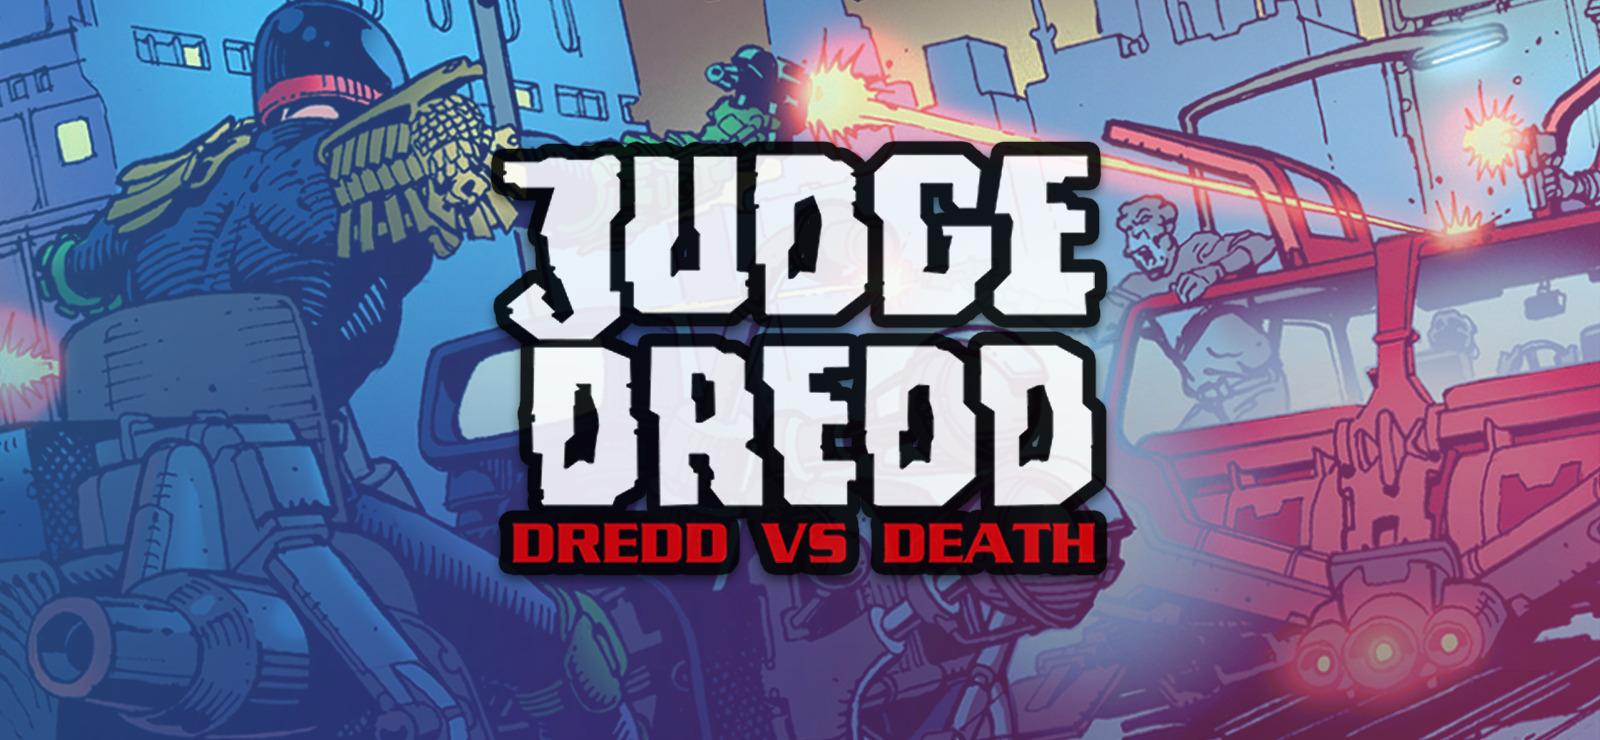 Judge Dredd Dredd Vs Death On Gogcom